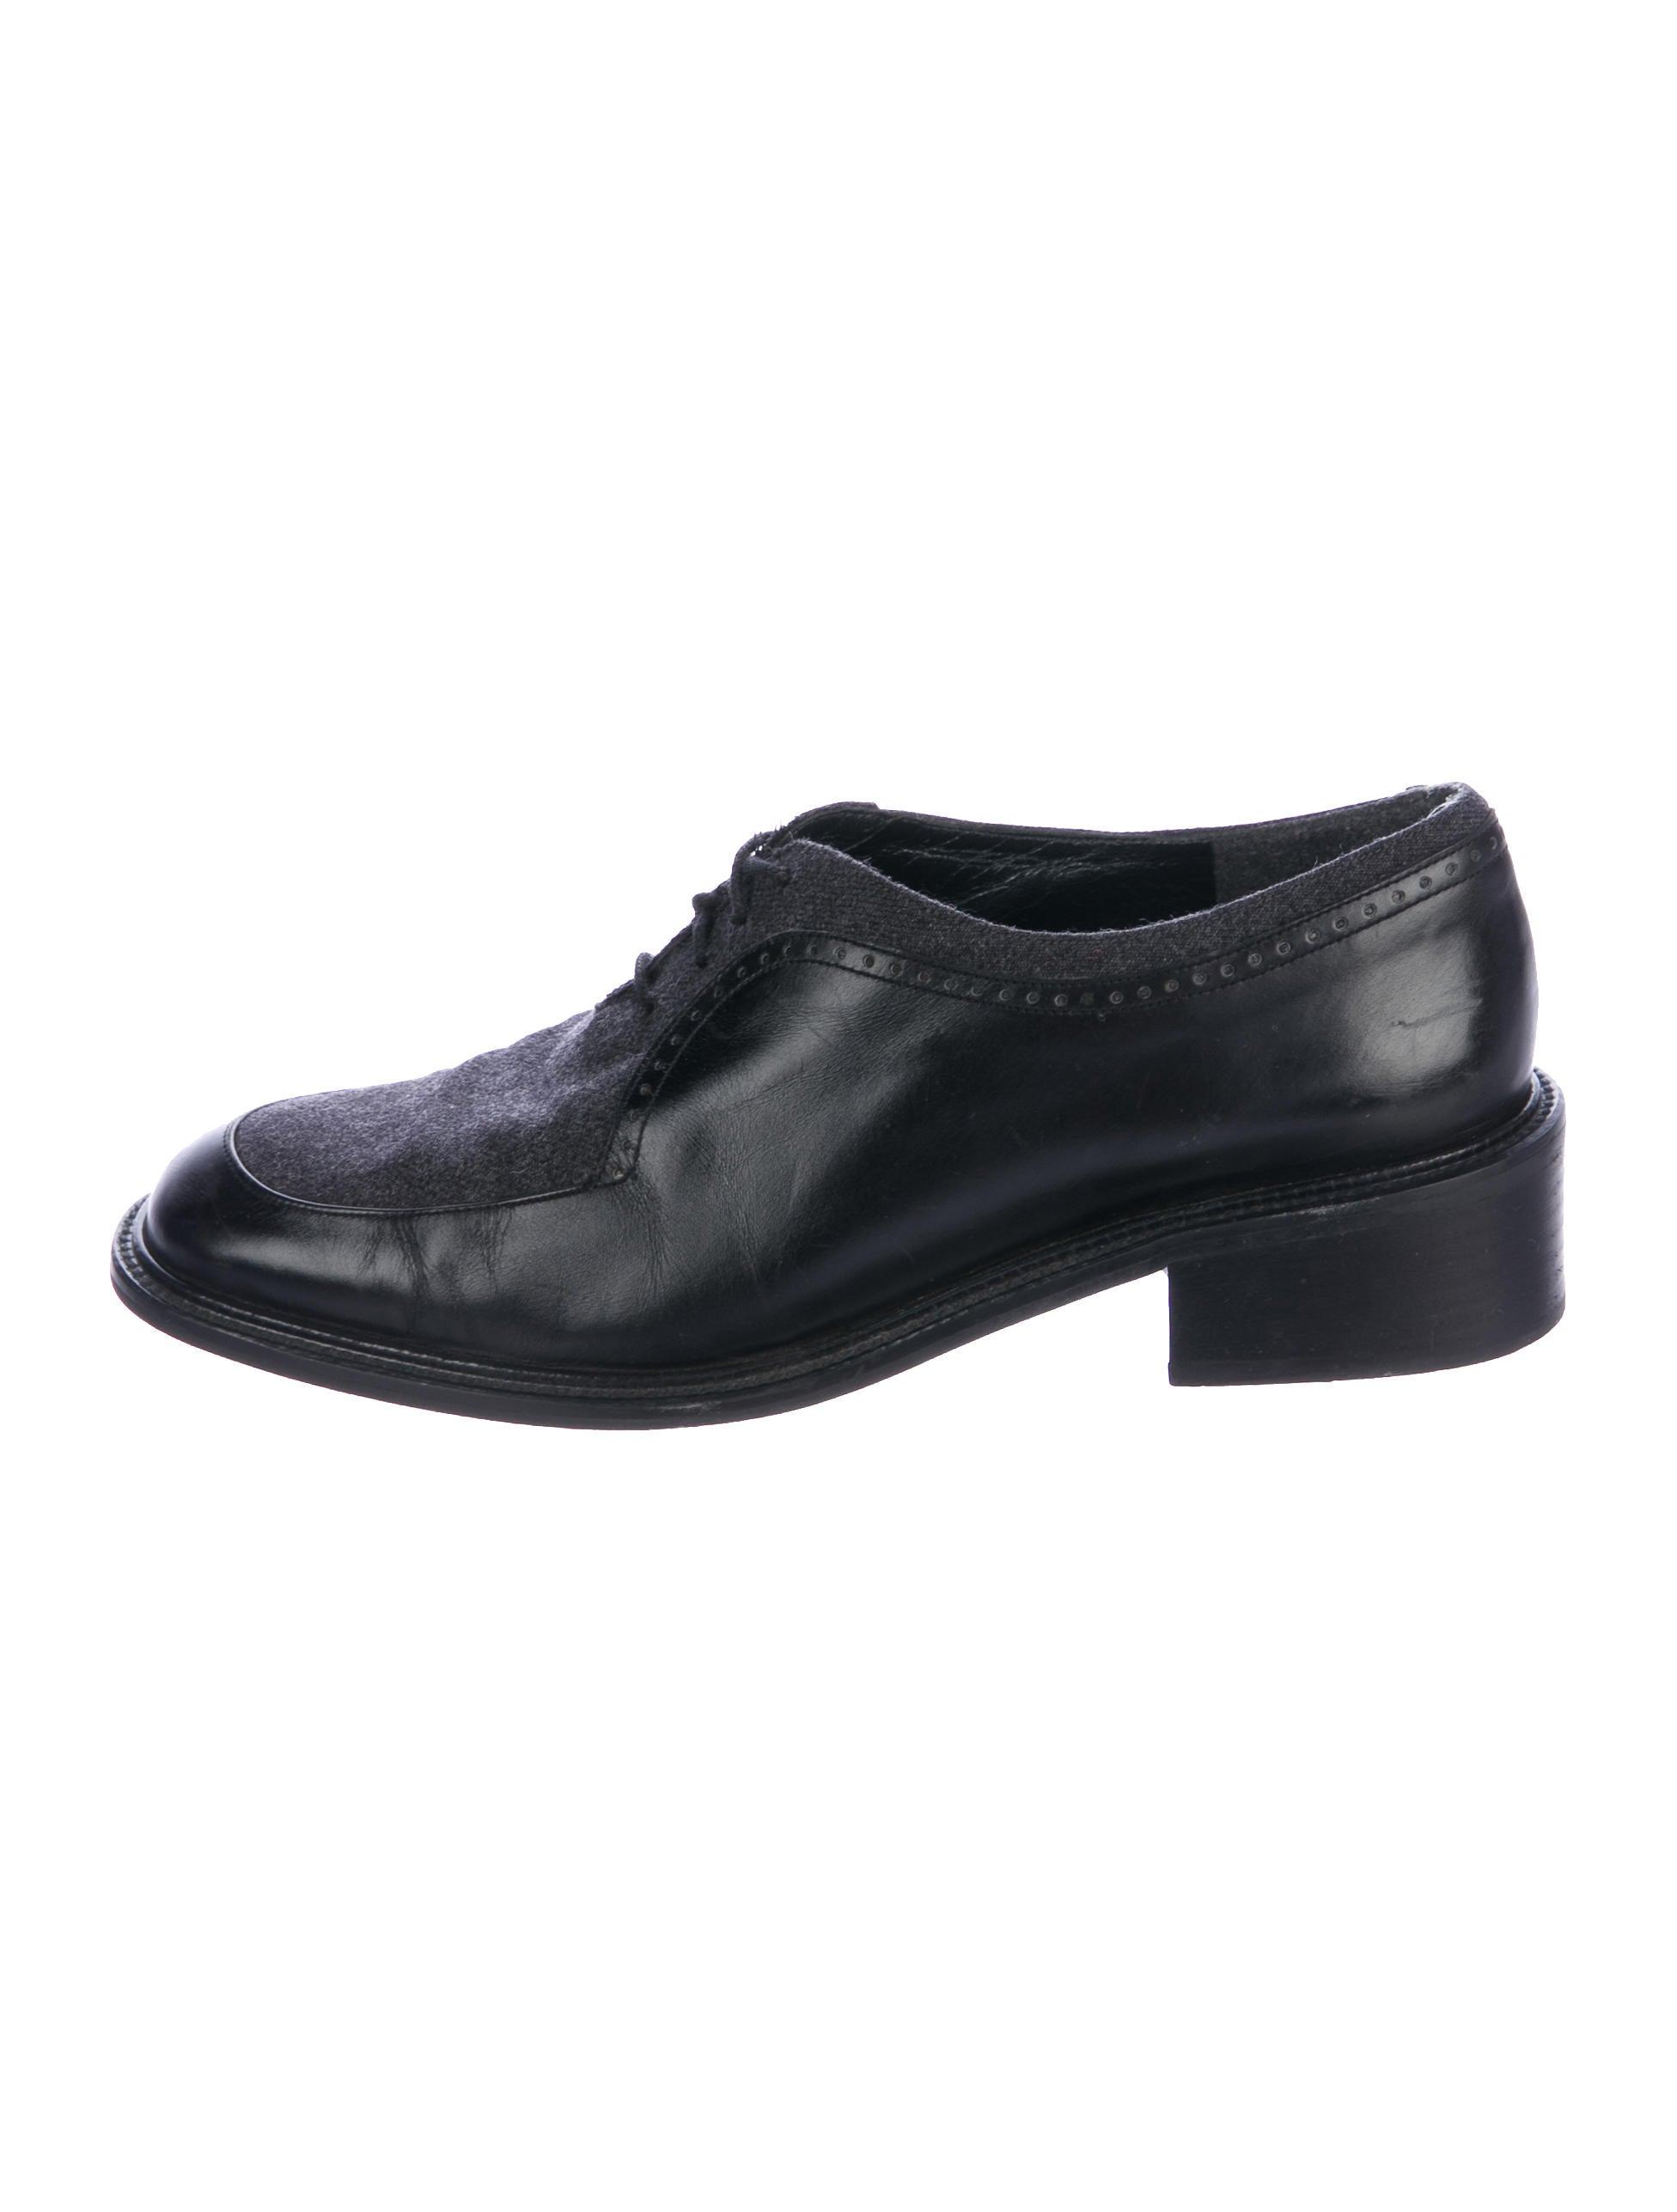 Stuart Weitzman Round-Toe Leather Oxfords sale discounts ad6KUT